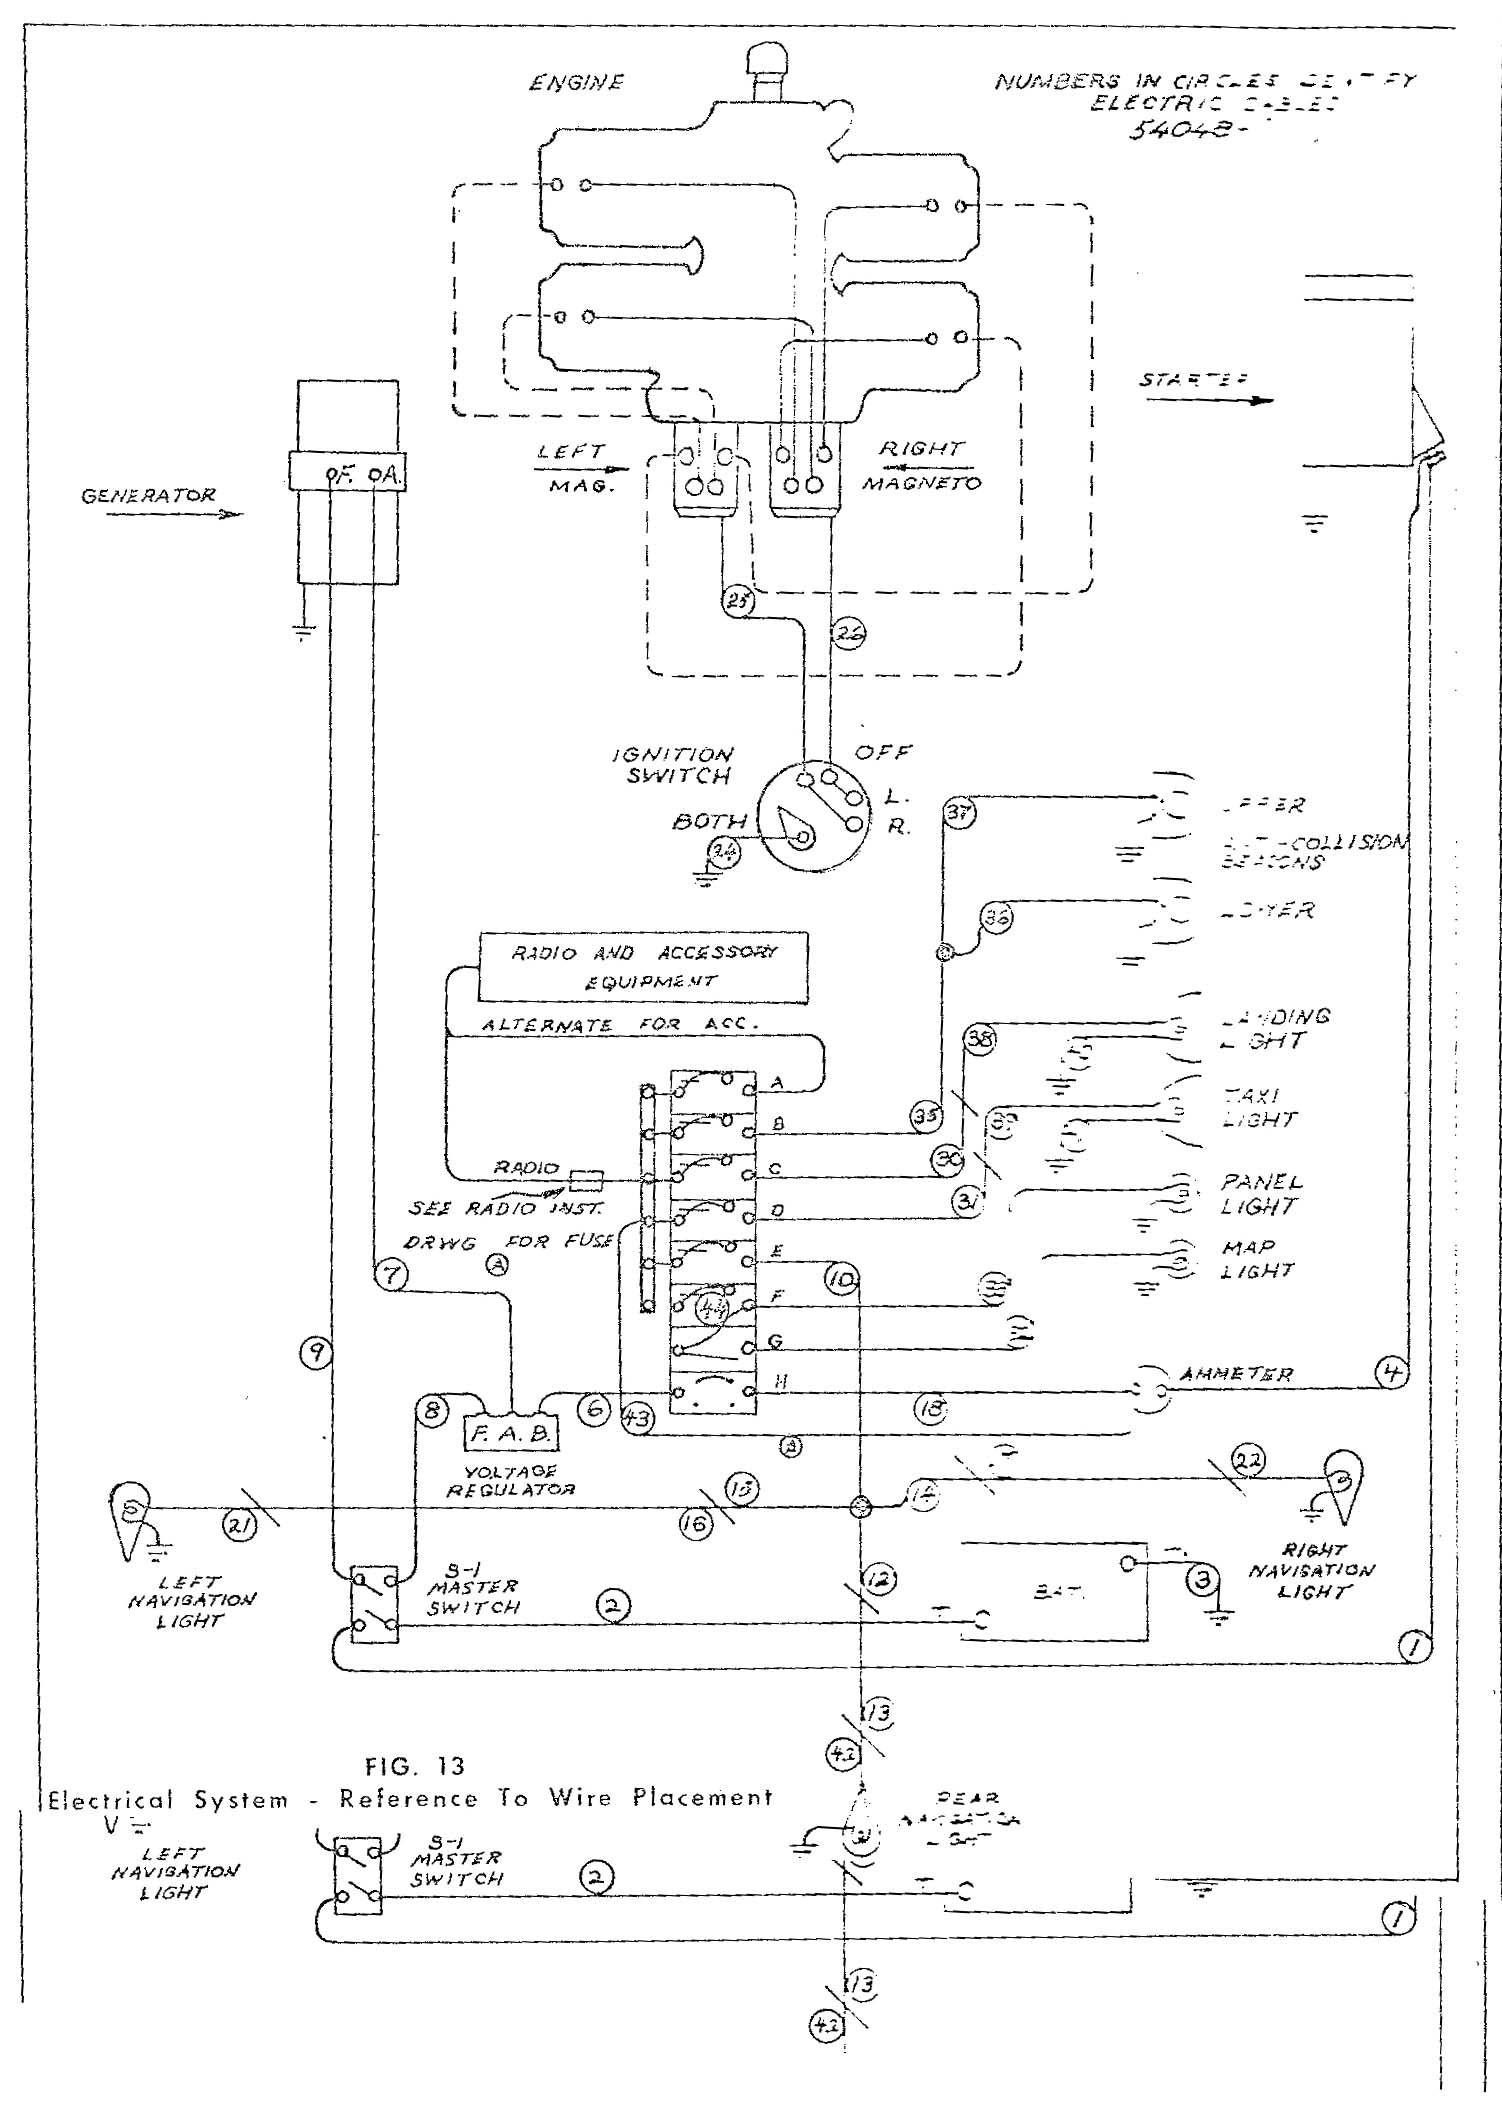 hight resolution of siemens shunt trip breaker wiring diagram wiring diagram for shuntsiemens shunt trip breaker wiring diagram wiring